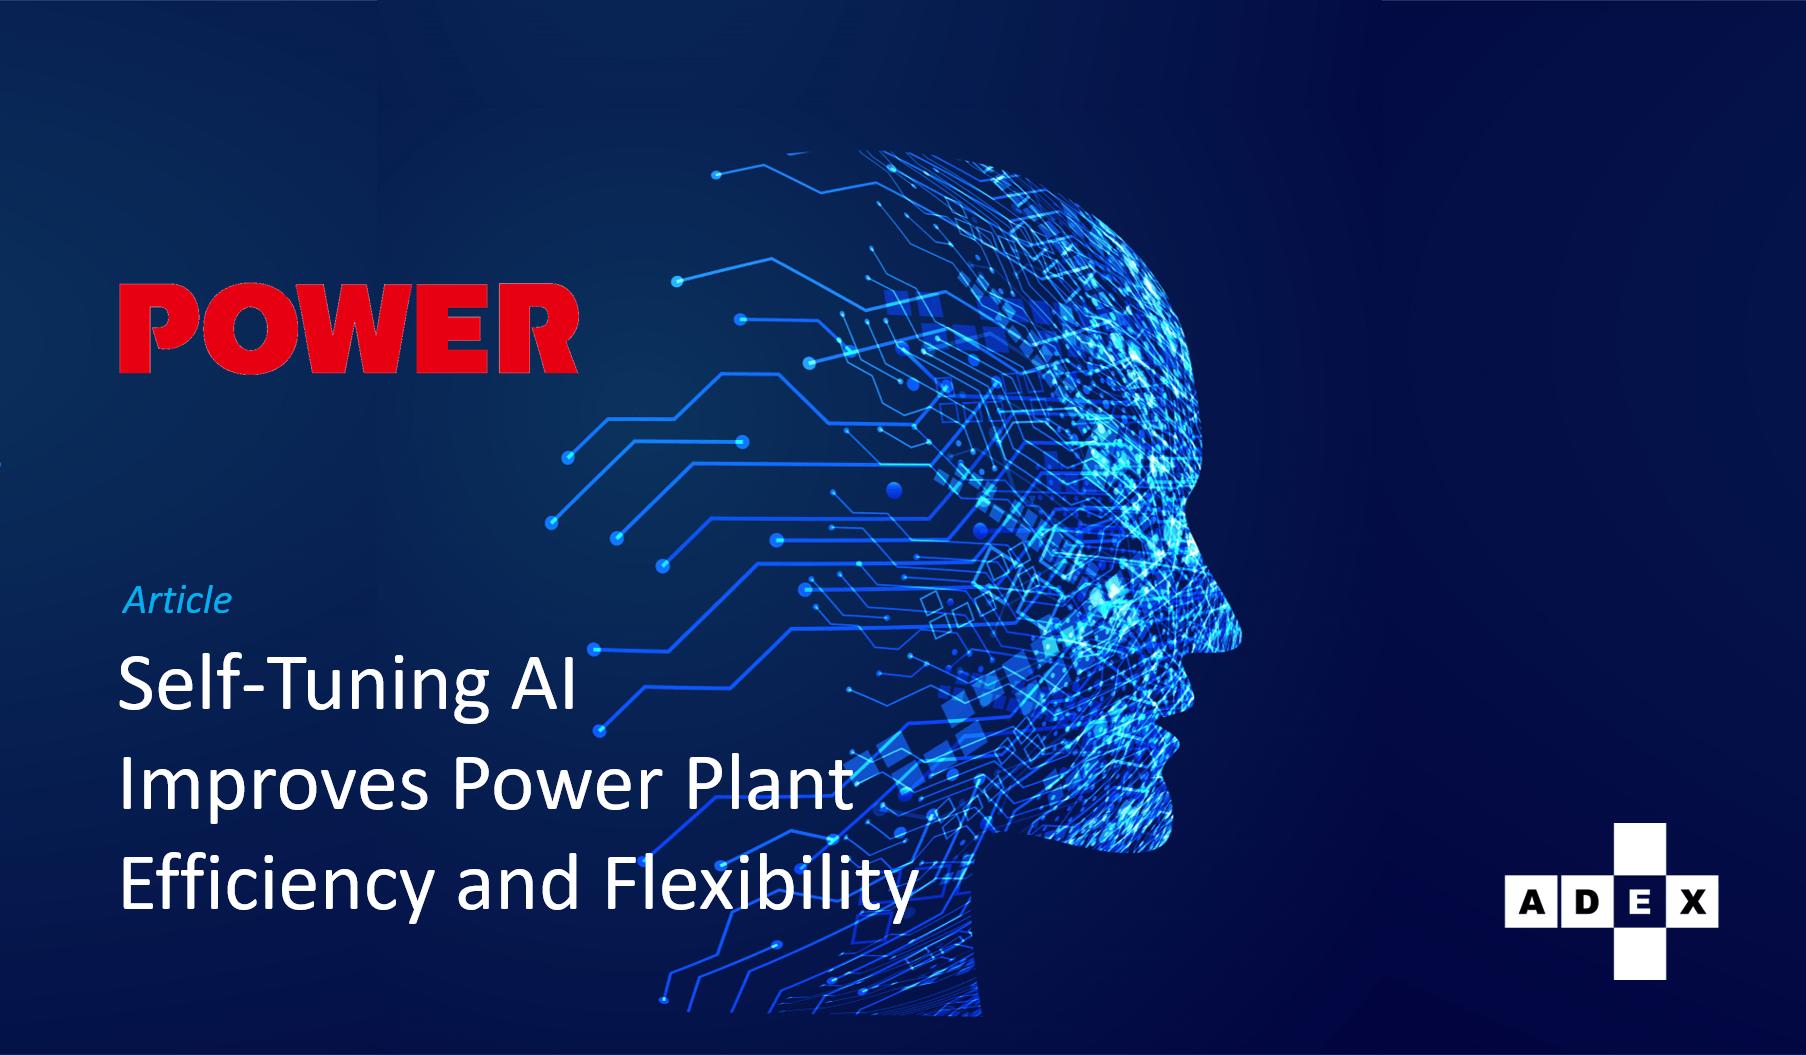 Digitalized body head showing ADEX AI capabilities